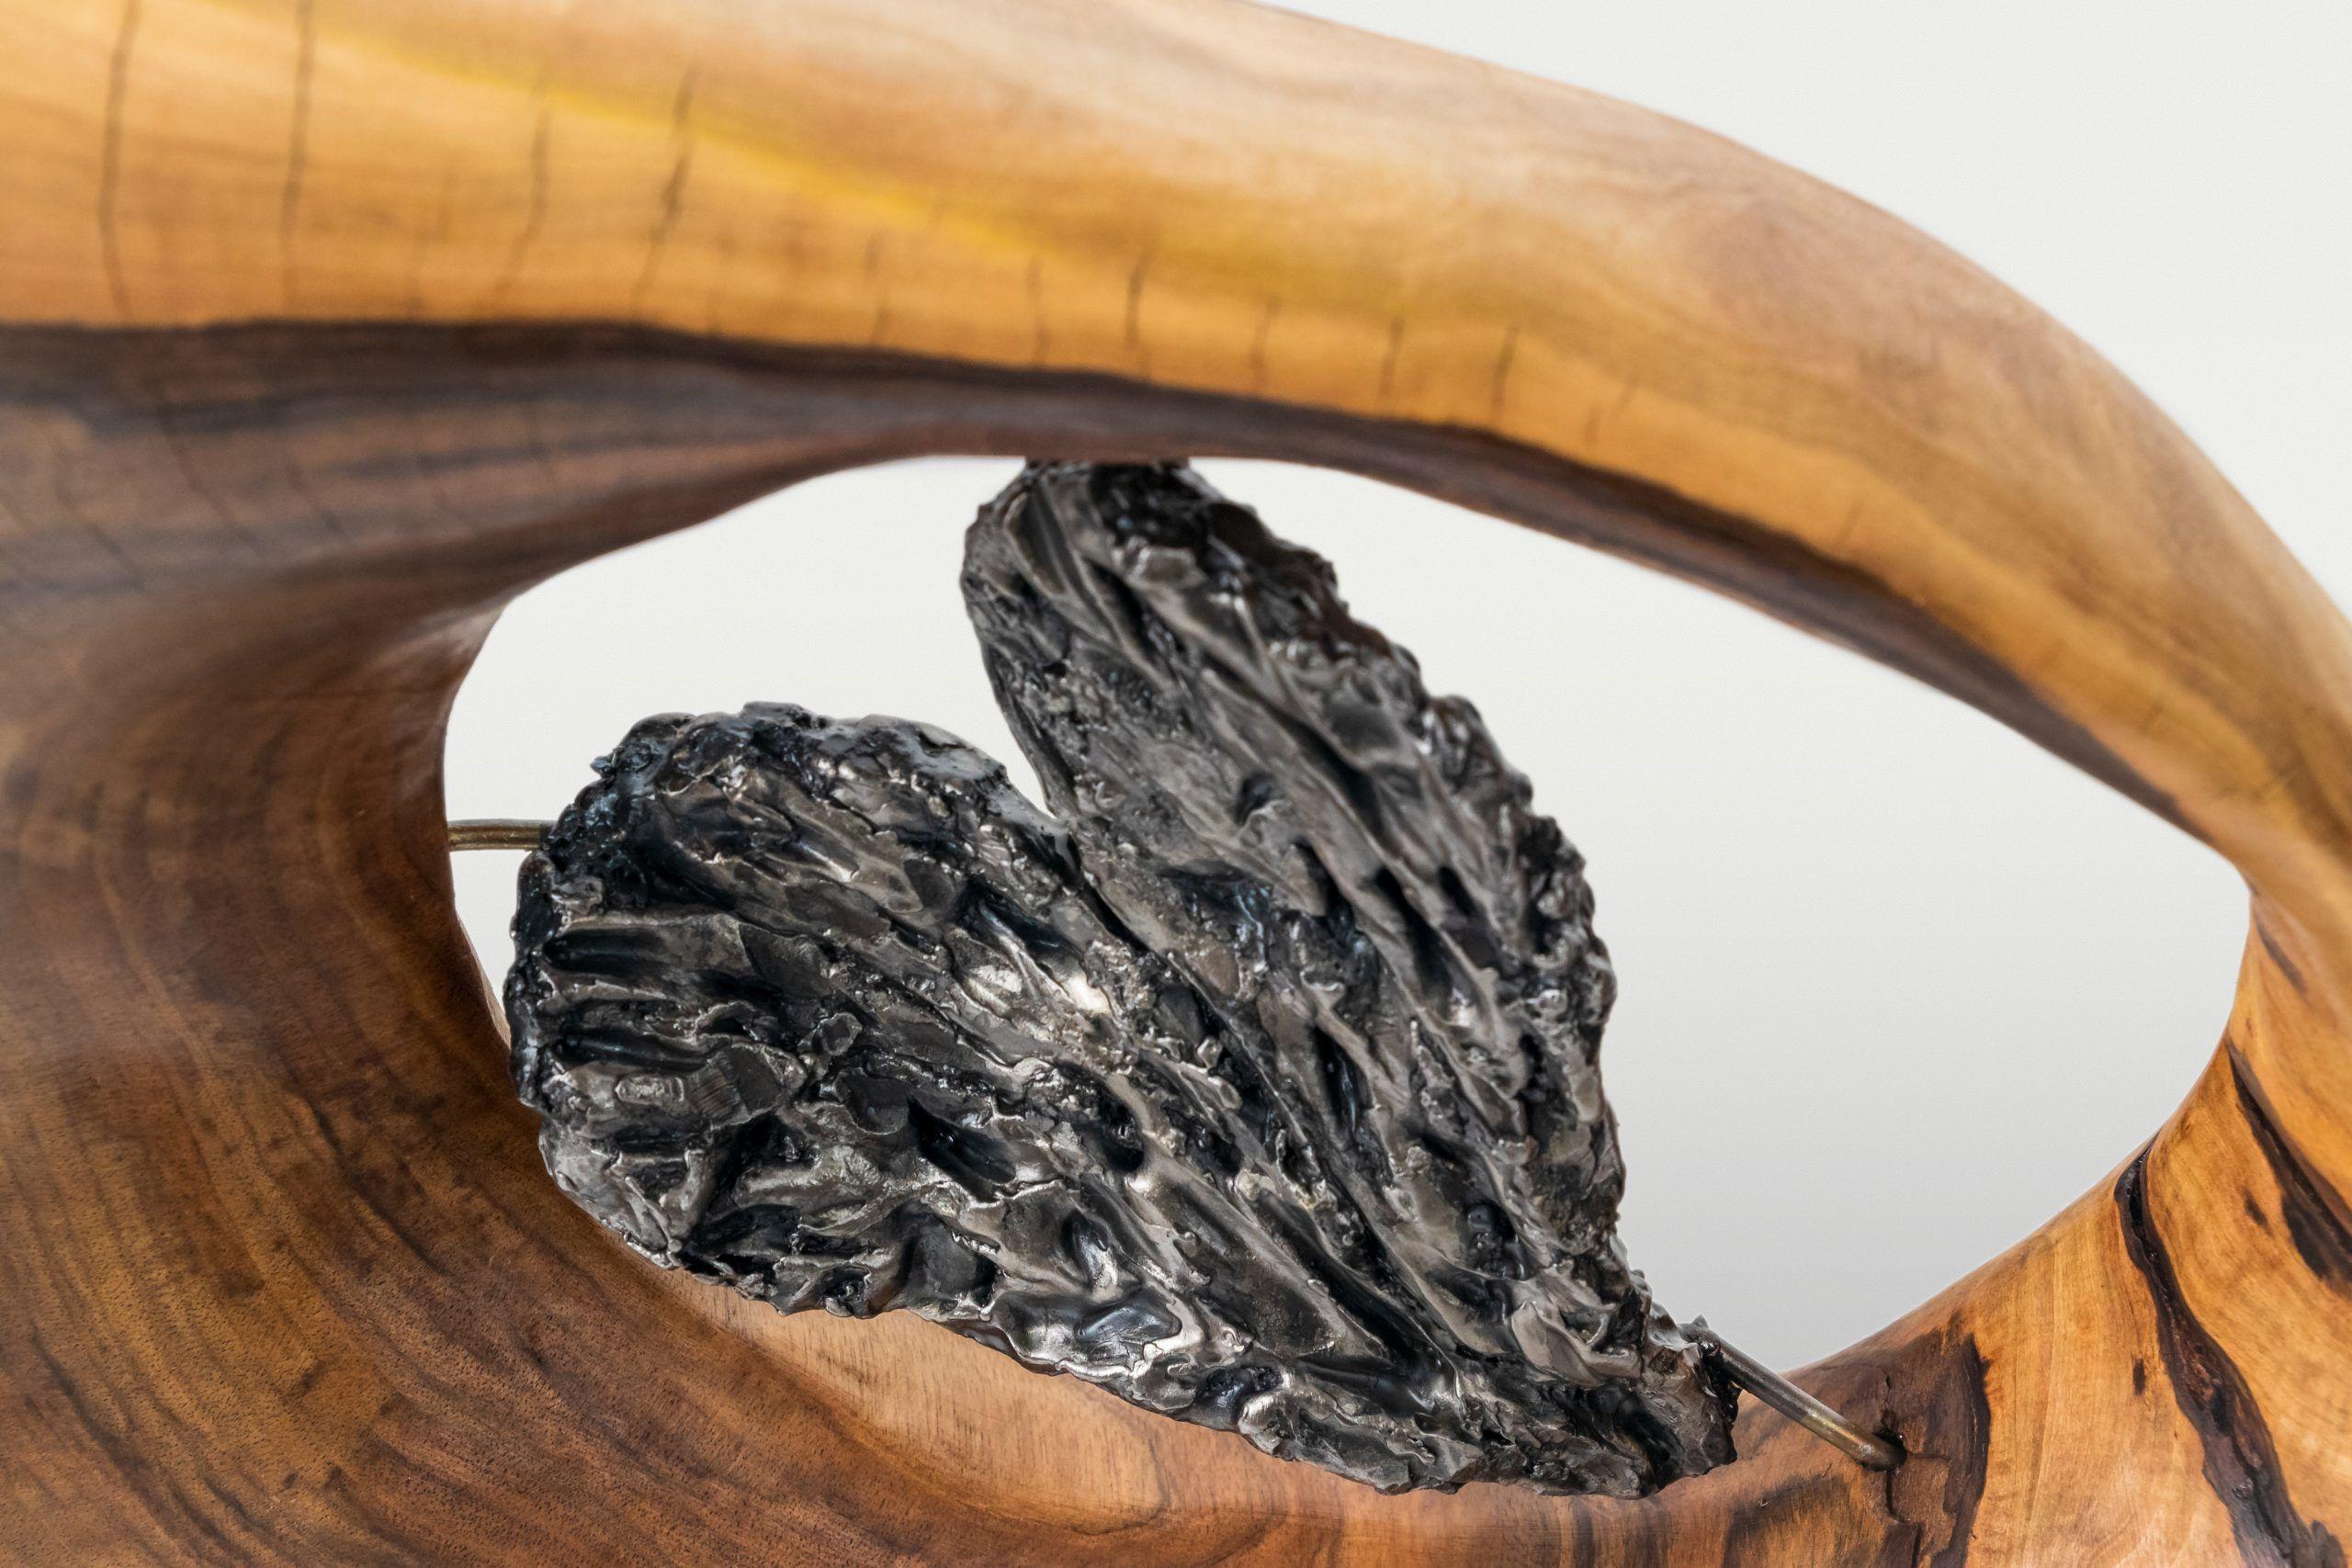 Atelier Hlavina: Peter Kuraj - Heart of wood